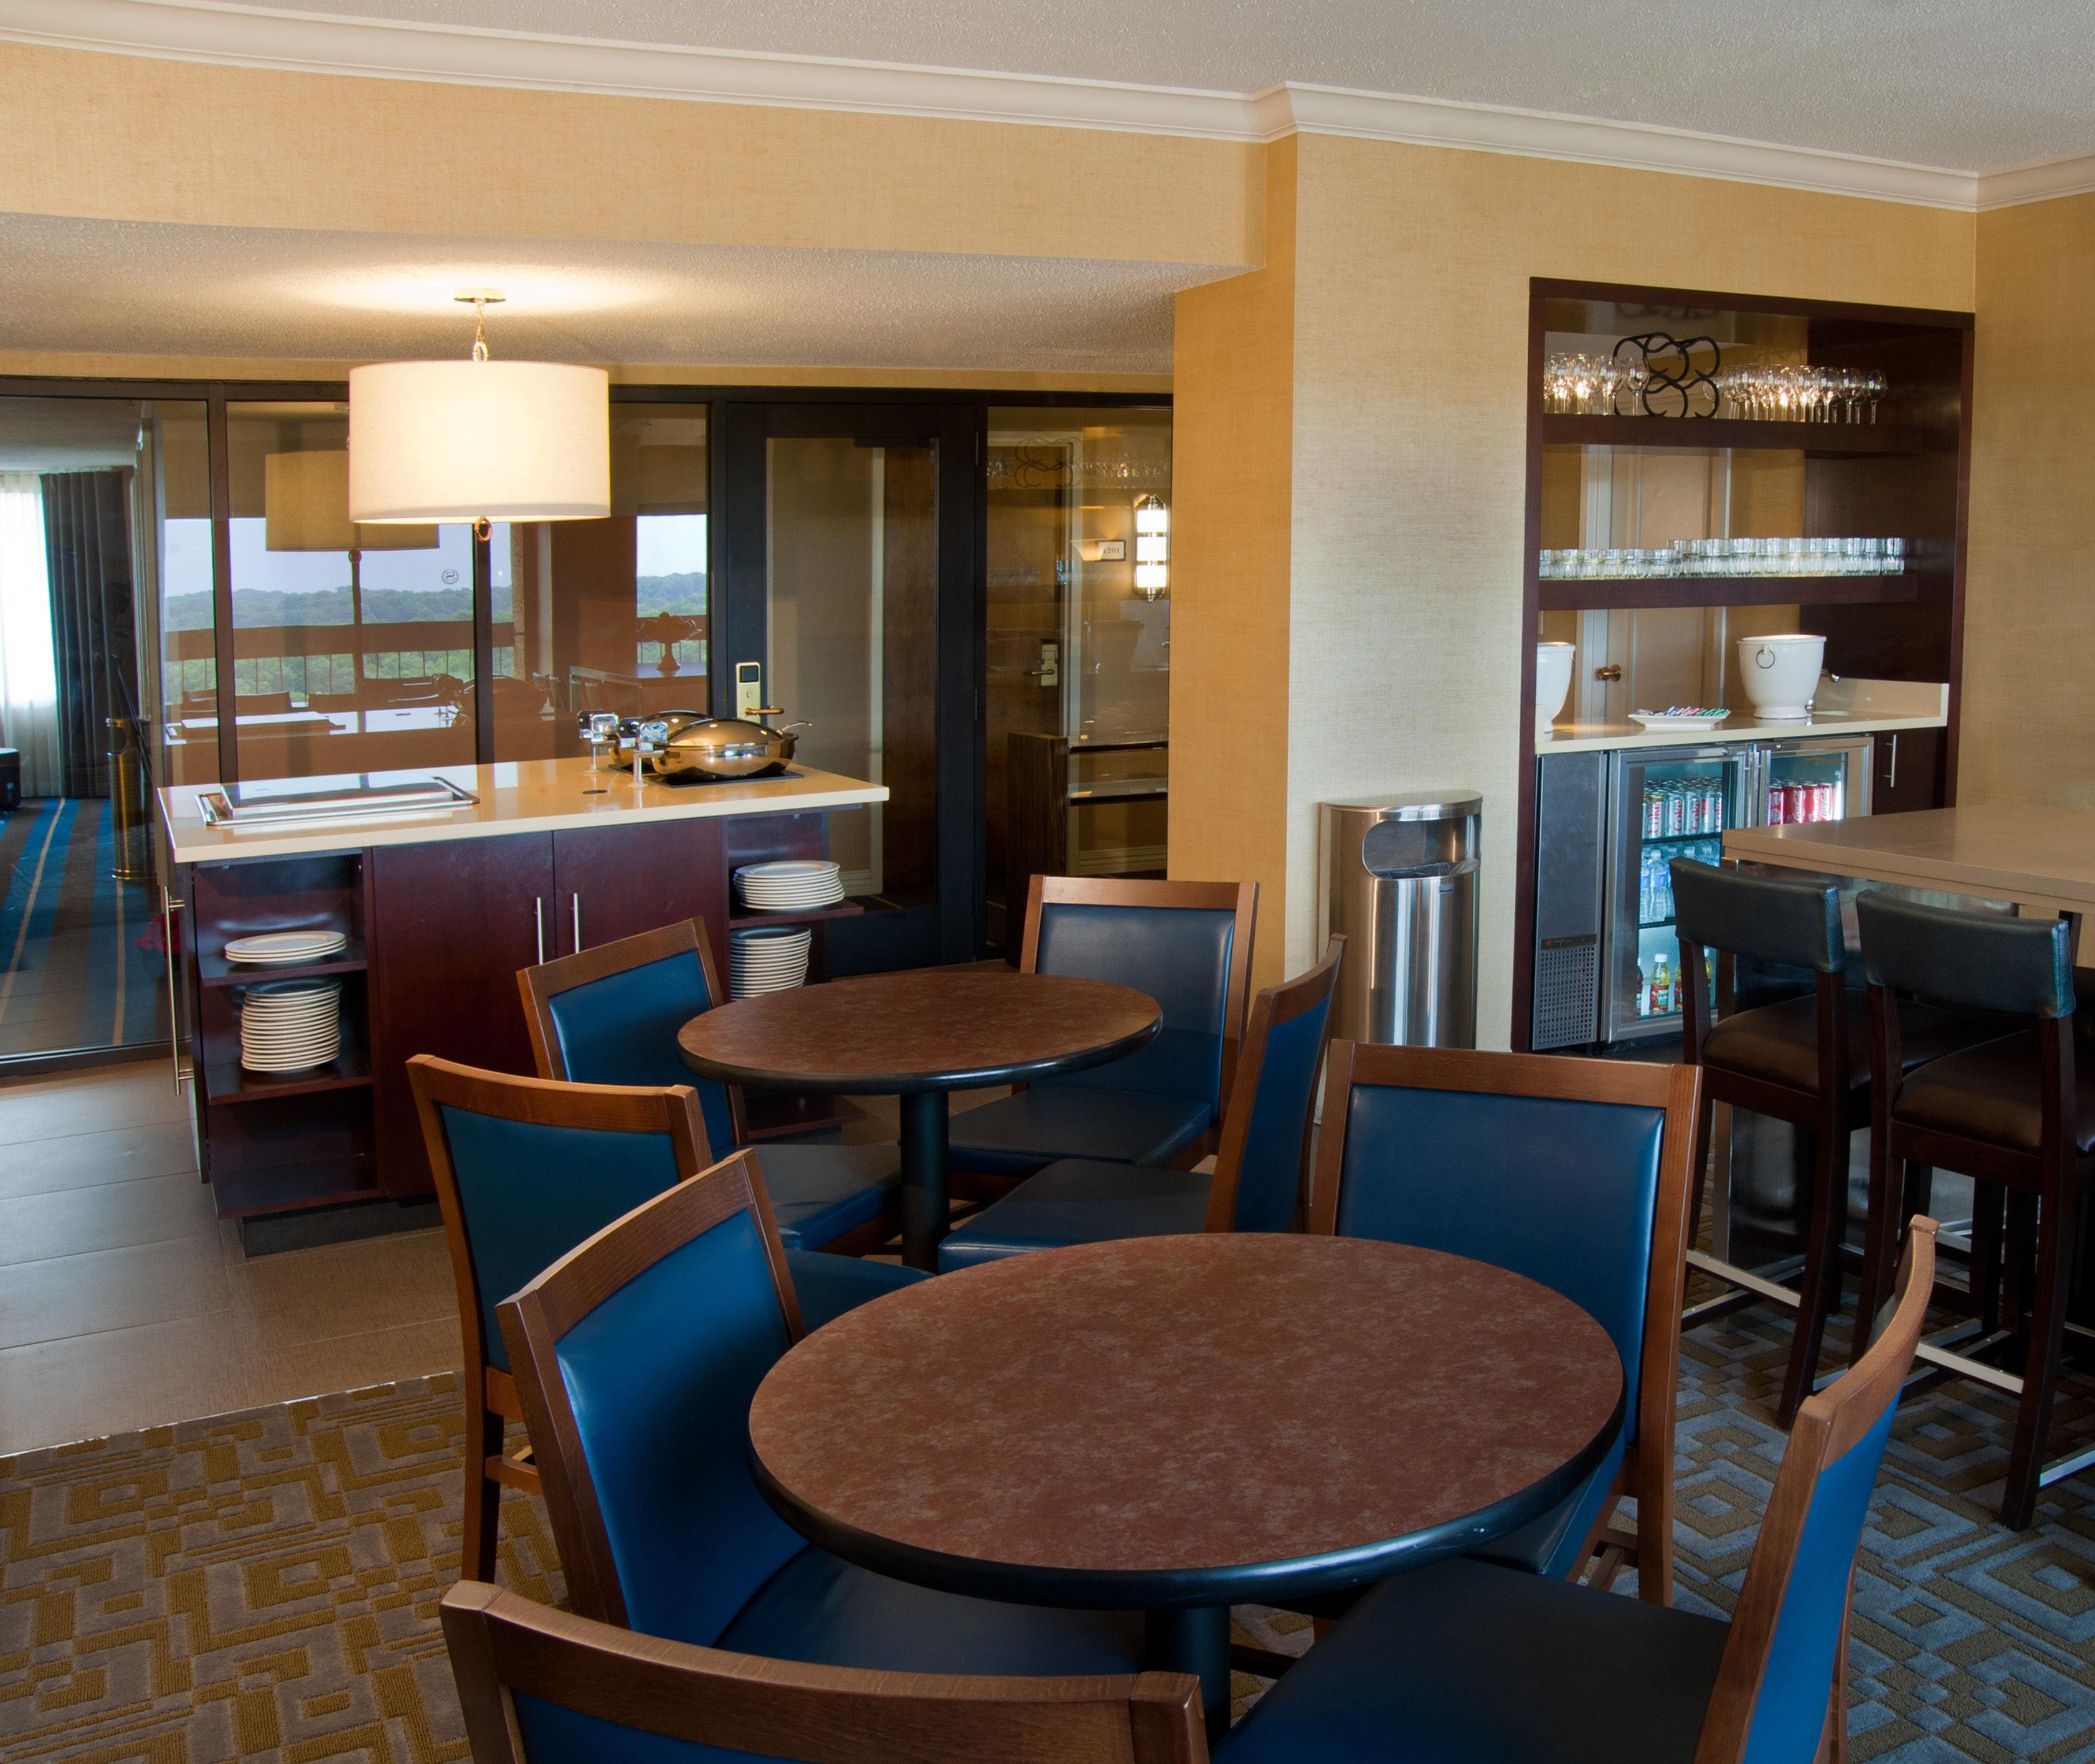 Sheraton Westport Plaza Hotel St. Louis image 8